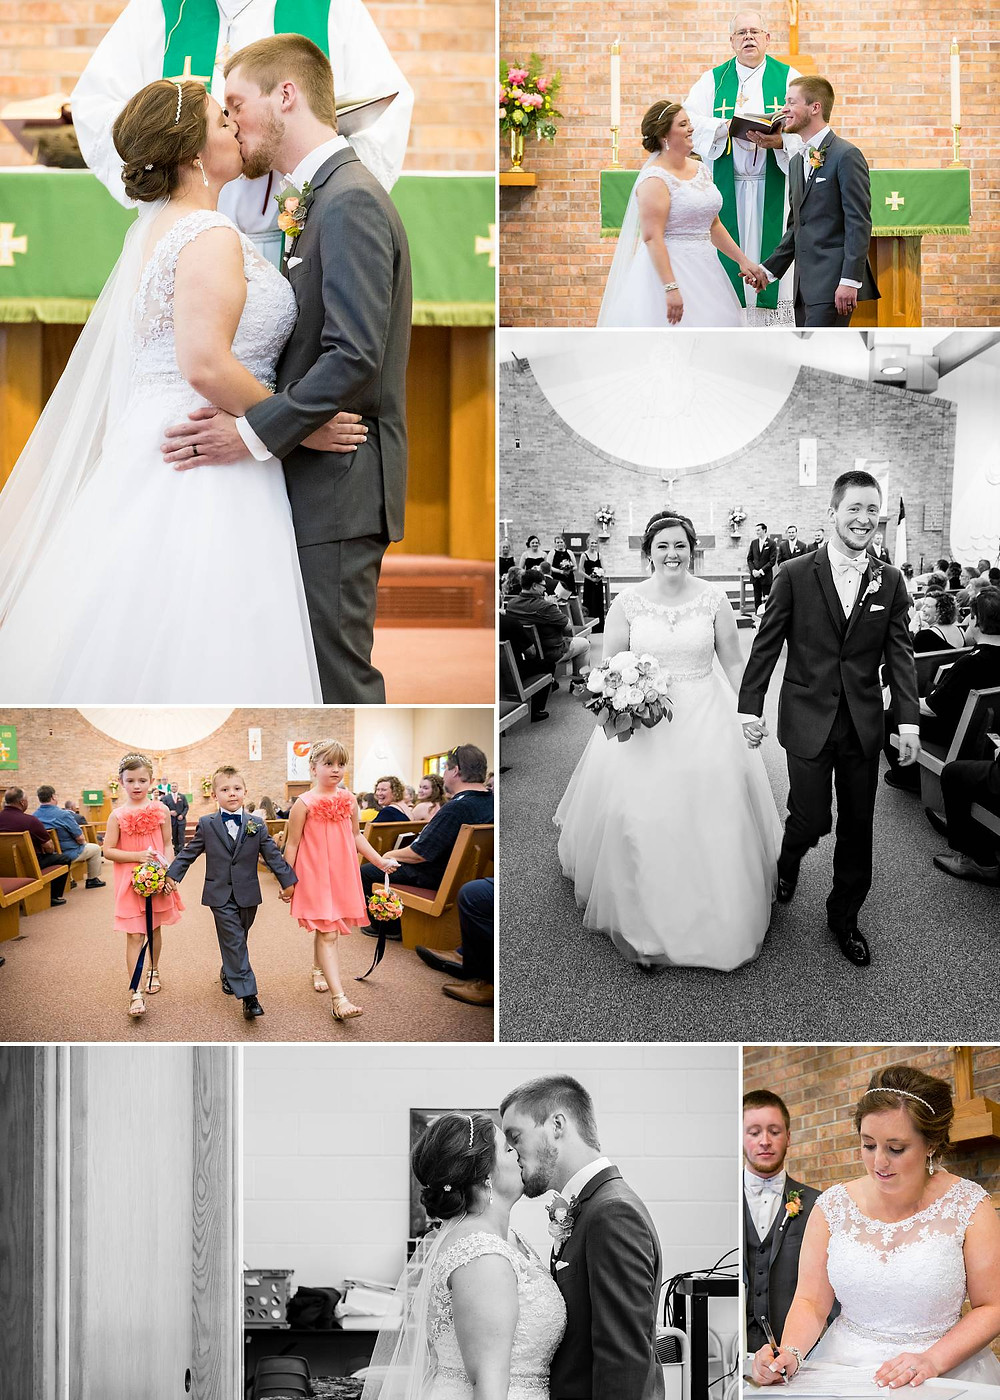 Oshkosh Wisconsin Summer Wedding Photographer   Lanari Photography